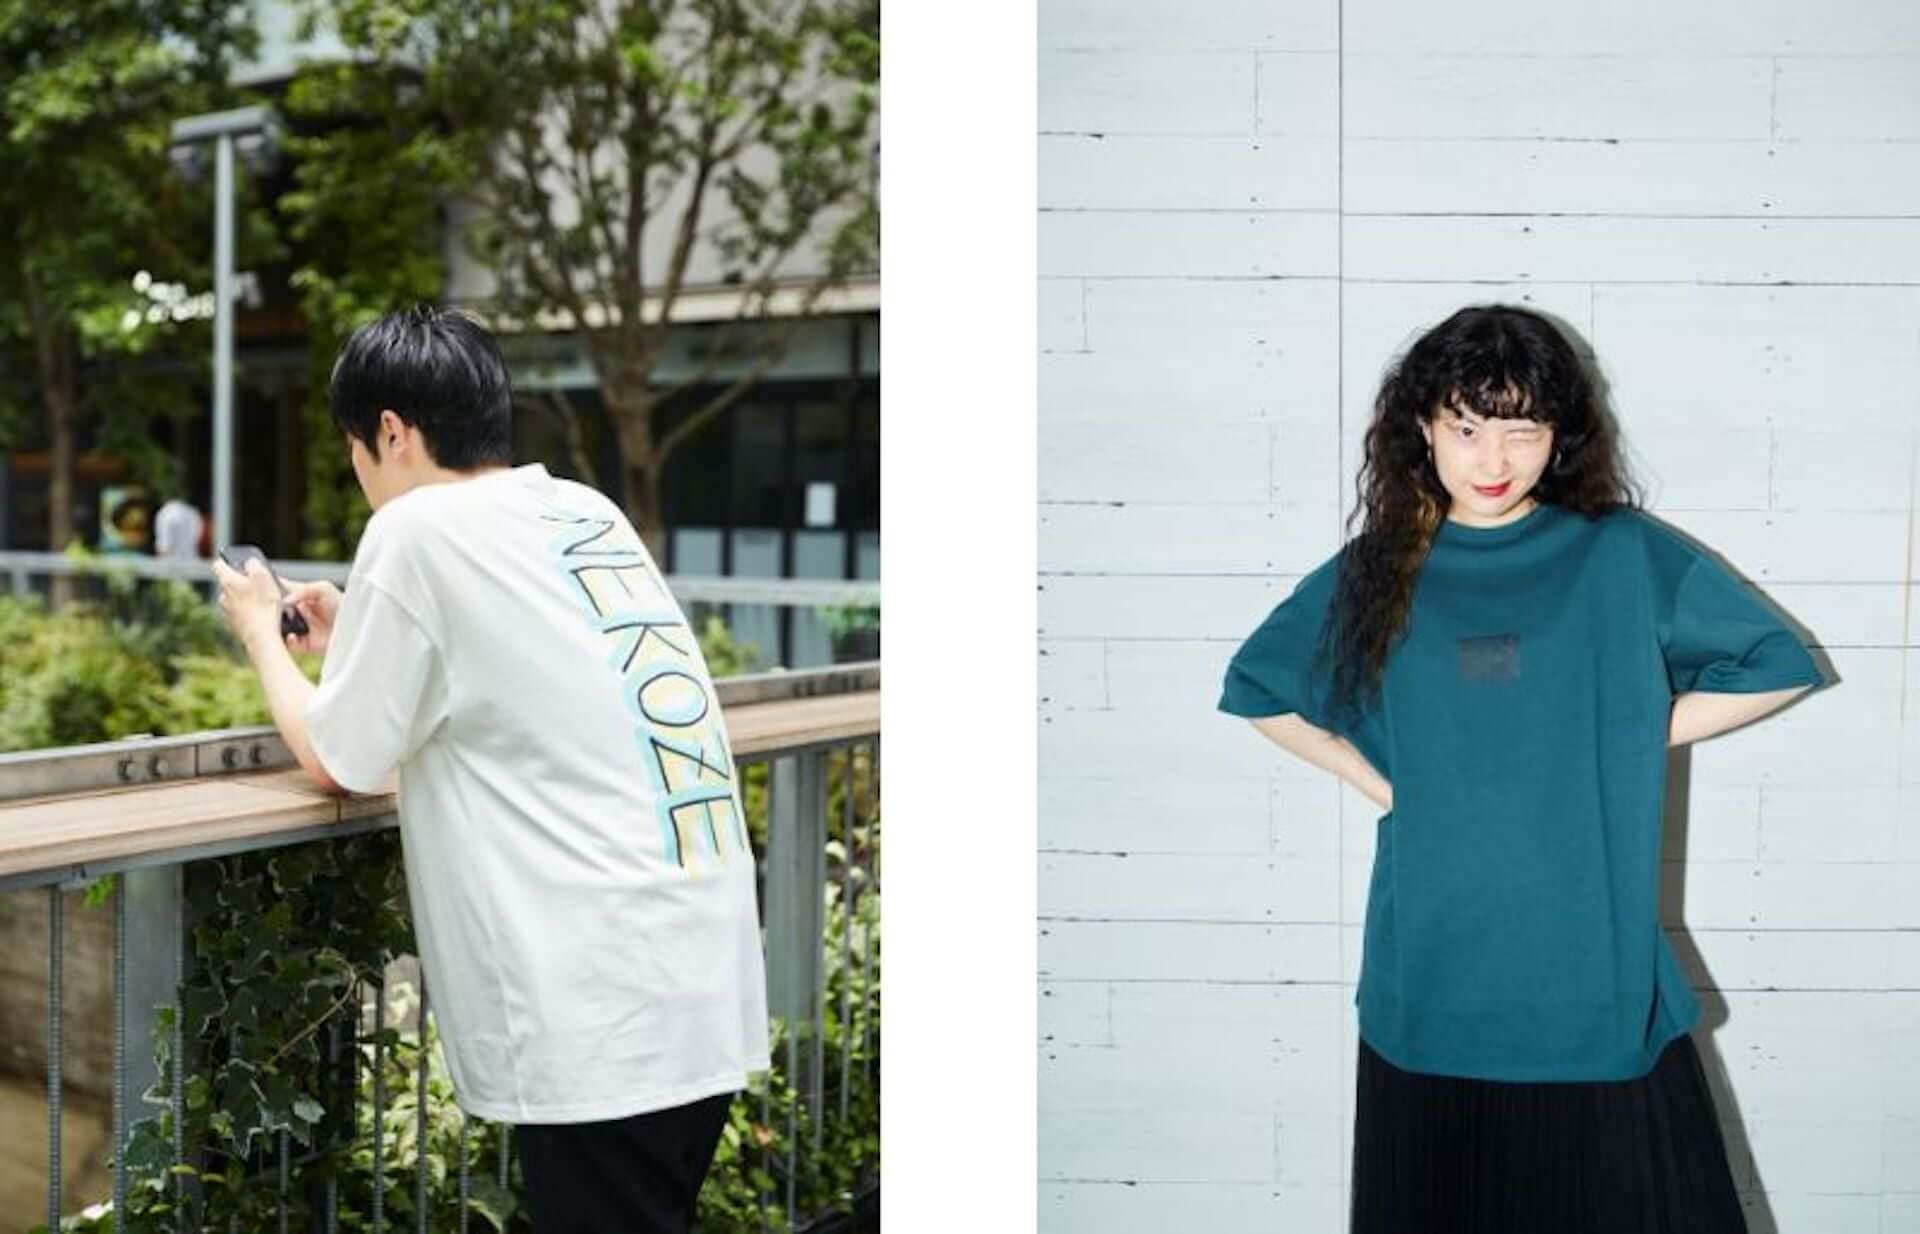 HARE×加賀美健の「TOKYO NONSENSE」第7弾コラボアイテムが販売決定!『勝負パンツ』『猫背T』等10点がラインナップ lf200730_tokyo-nonsense_3-1920x1234